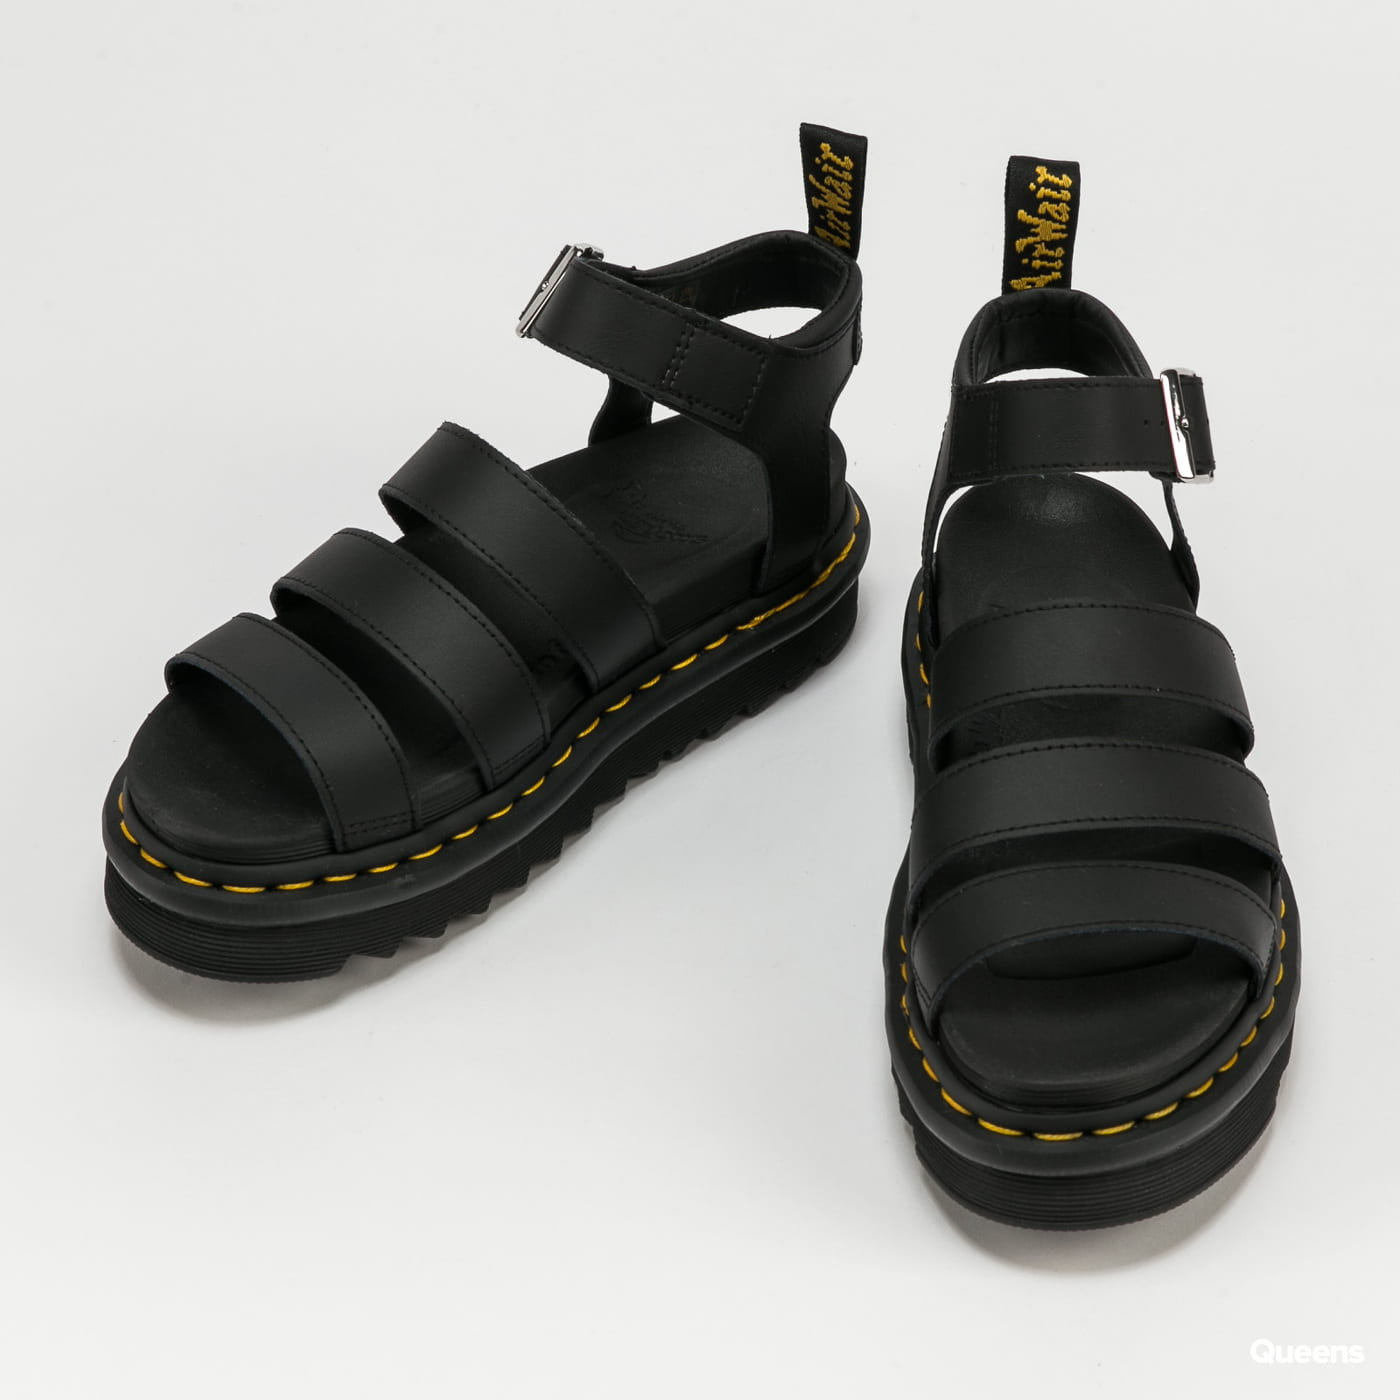 Dr. Martens Blaire black hydro leather